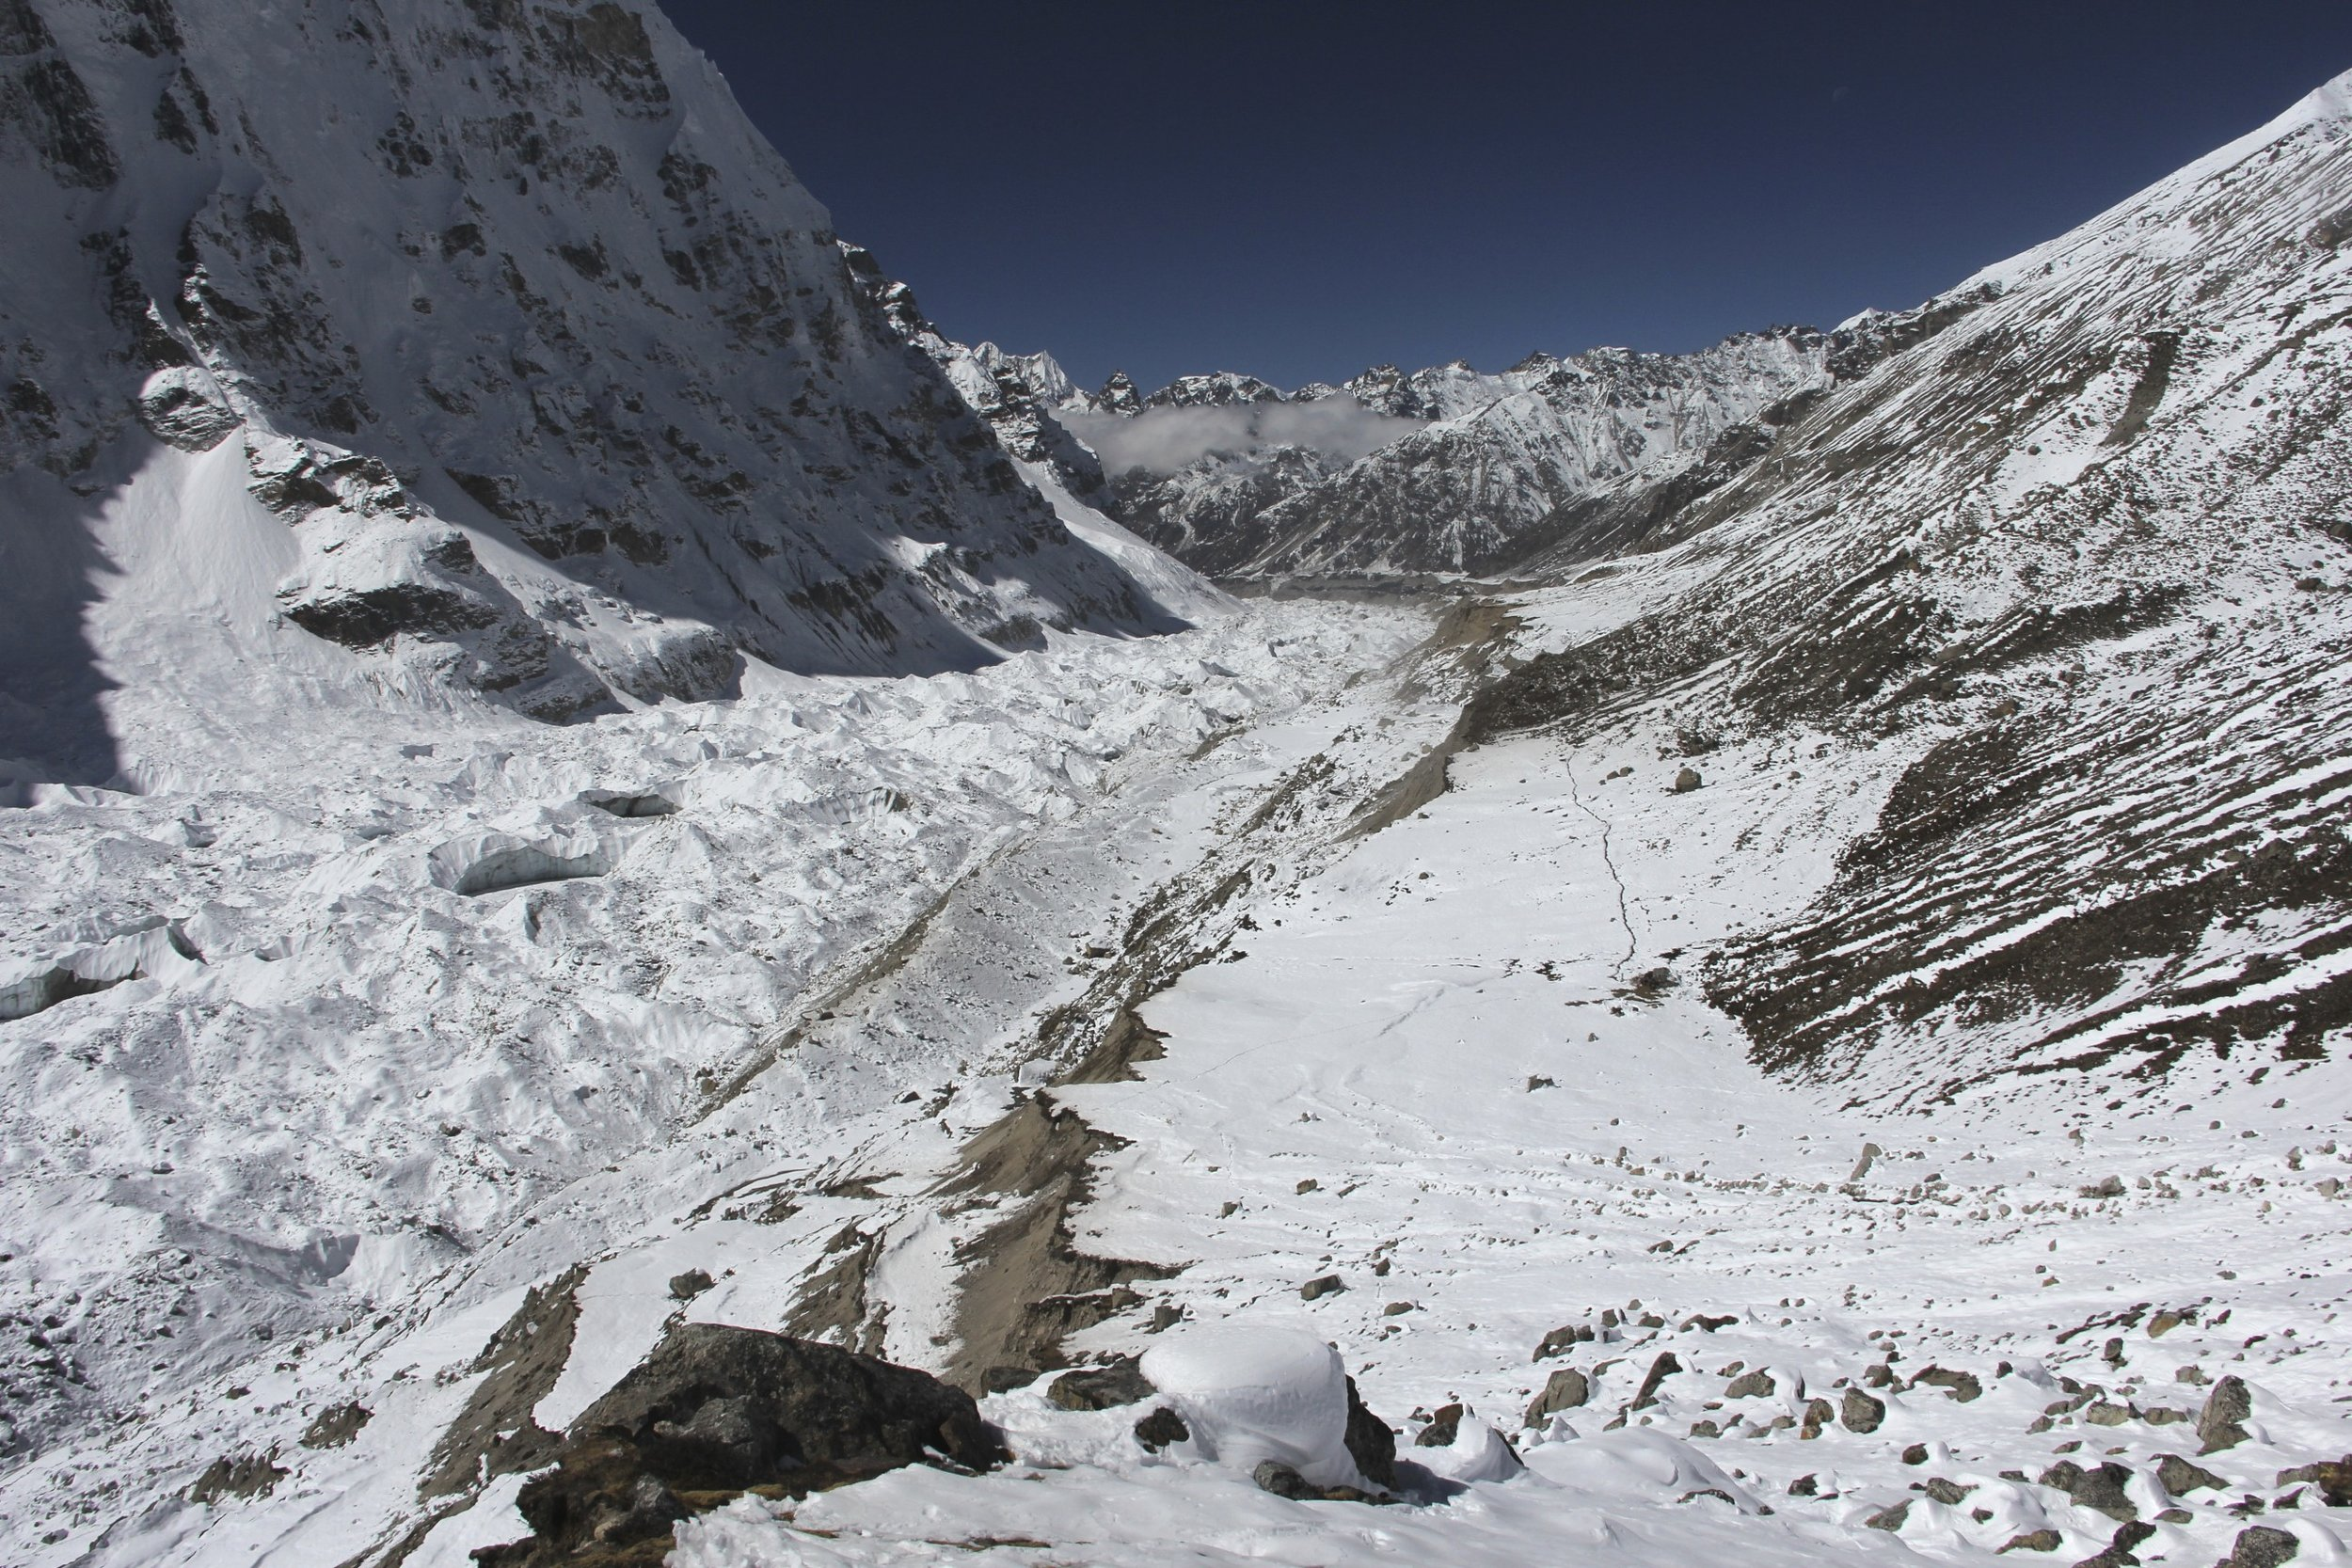 Kanchendzonga Glacier and Pangpema looking from the slopes above the Pangpema camp.